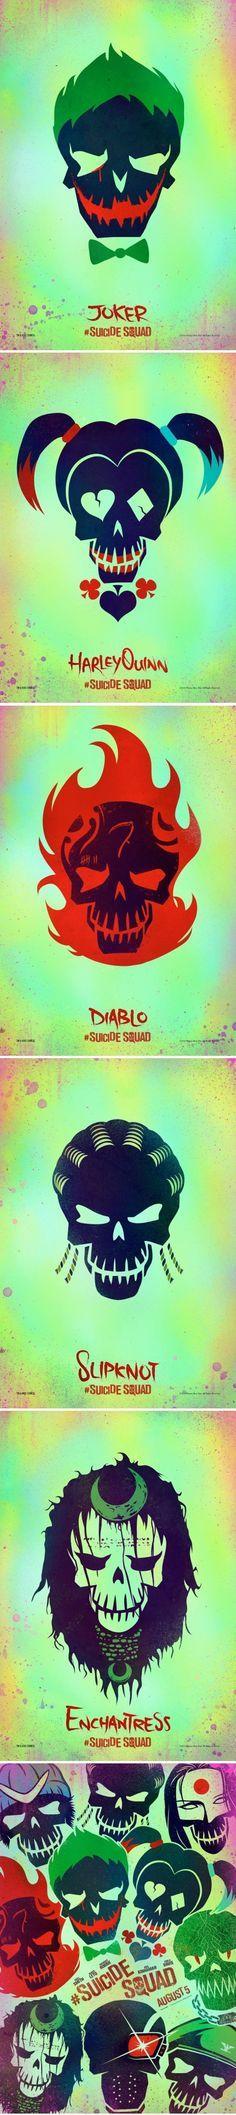 Suicide Squad Character Posters - Joker, Harley Quinn, Diablo, Slipknot & Enchantress